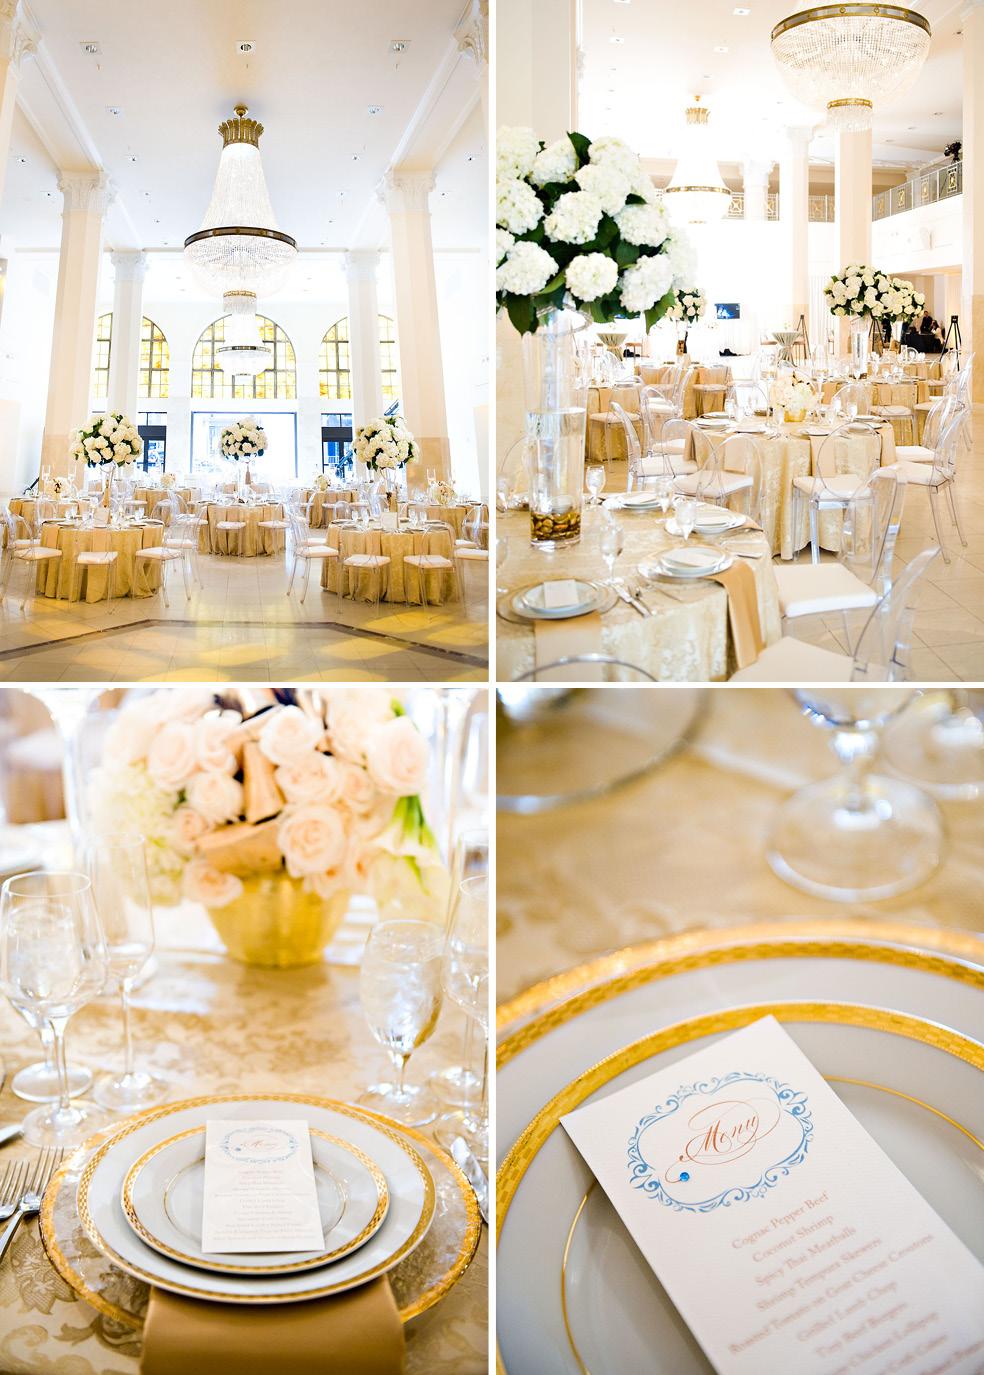 Kim Biermanns Wedding Cake